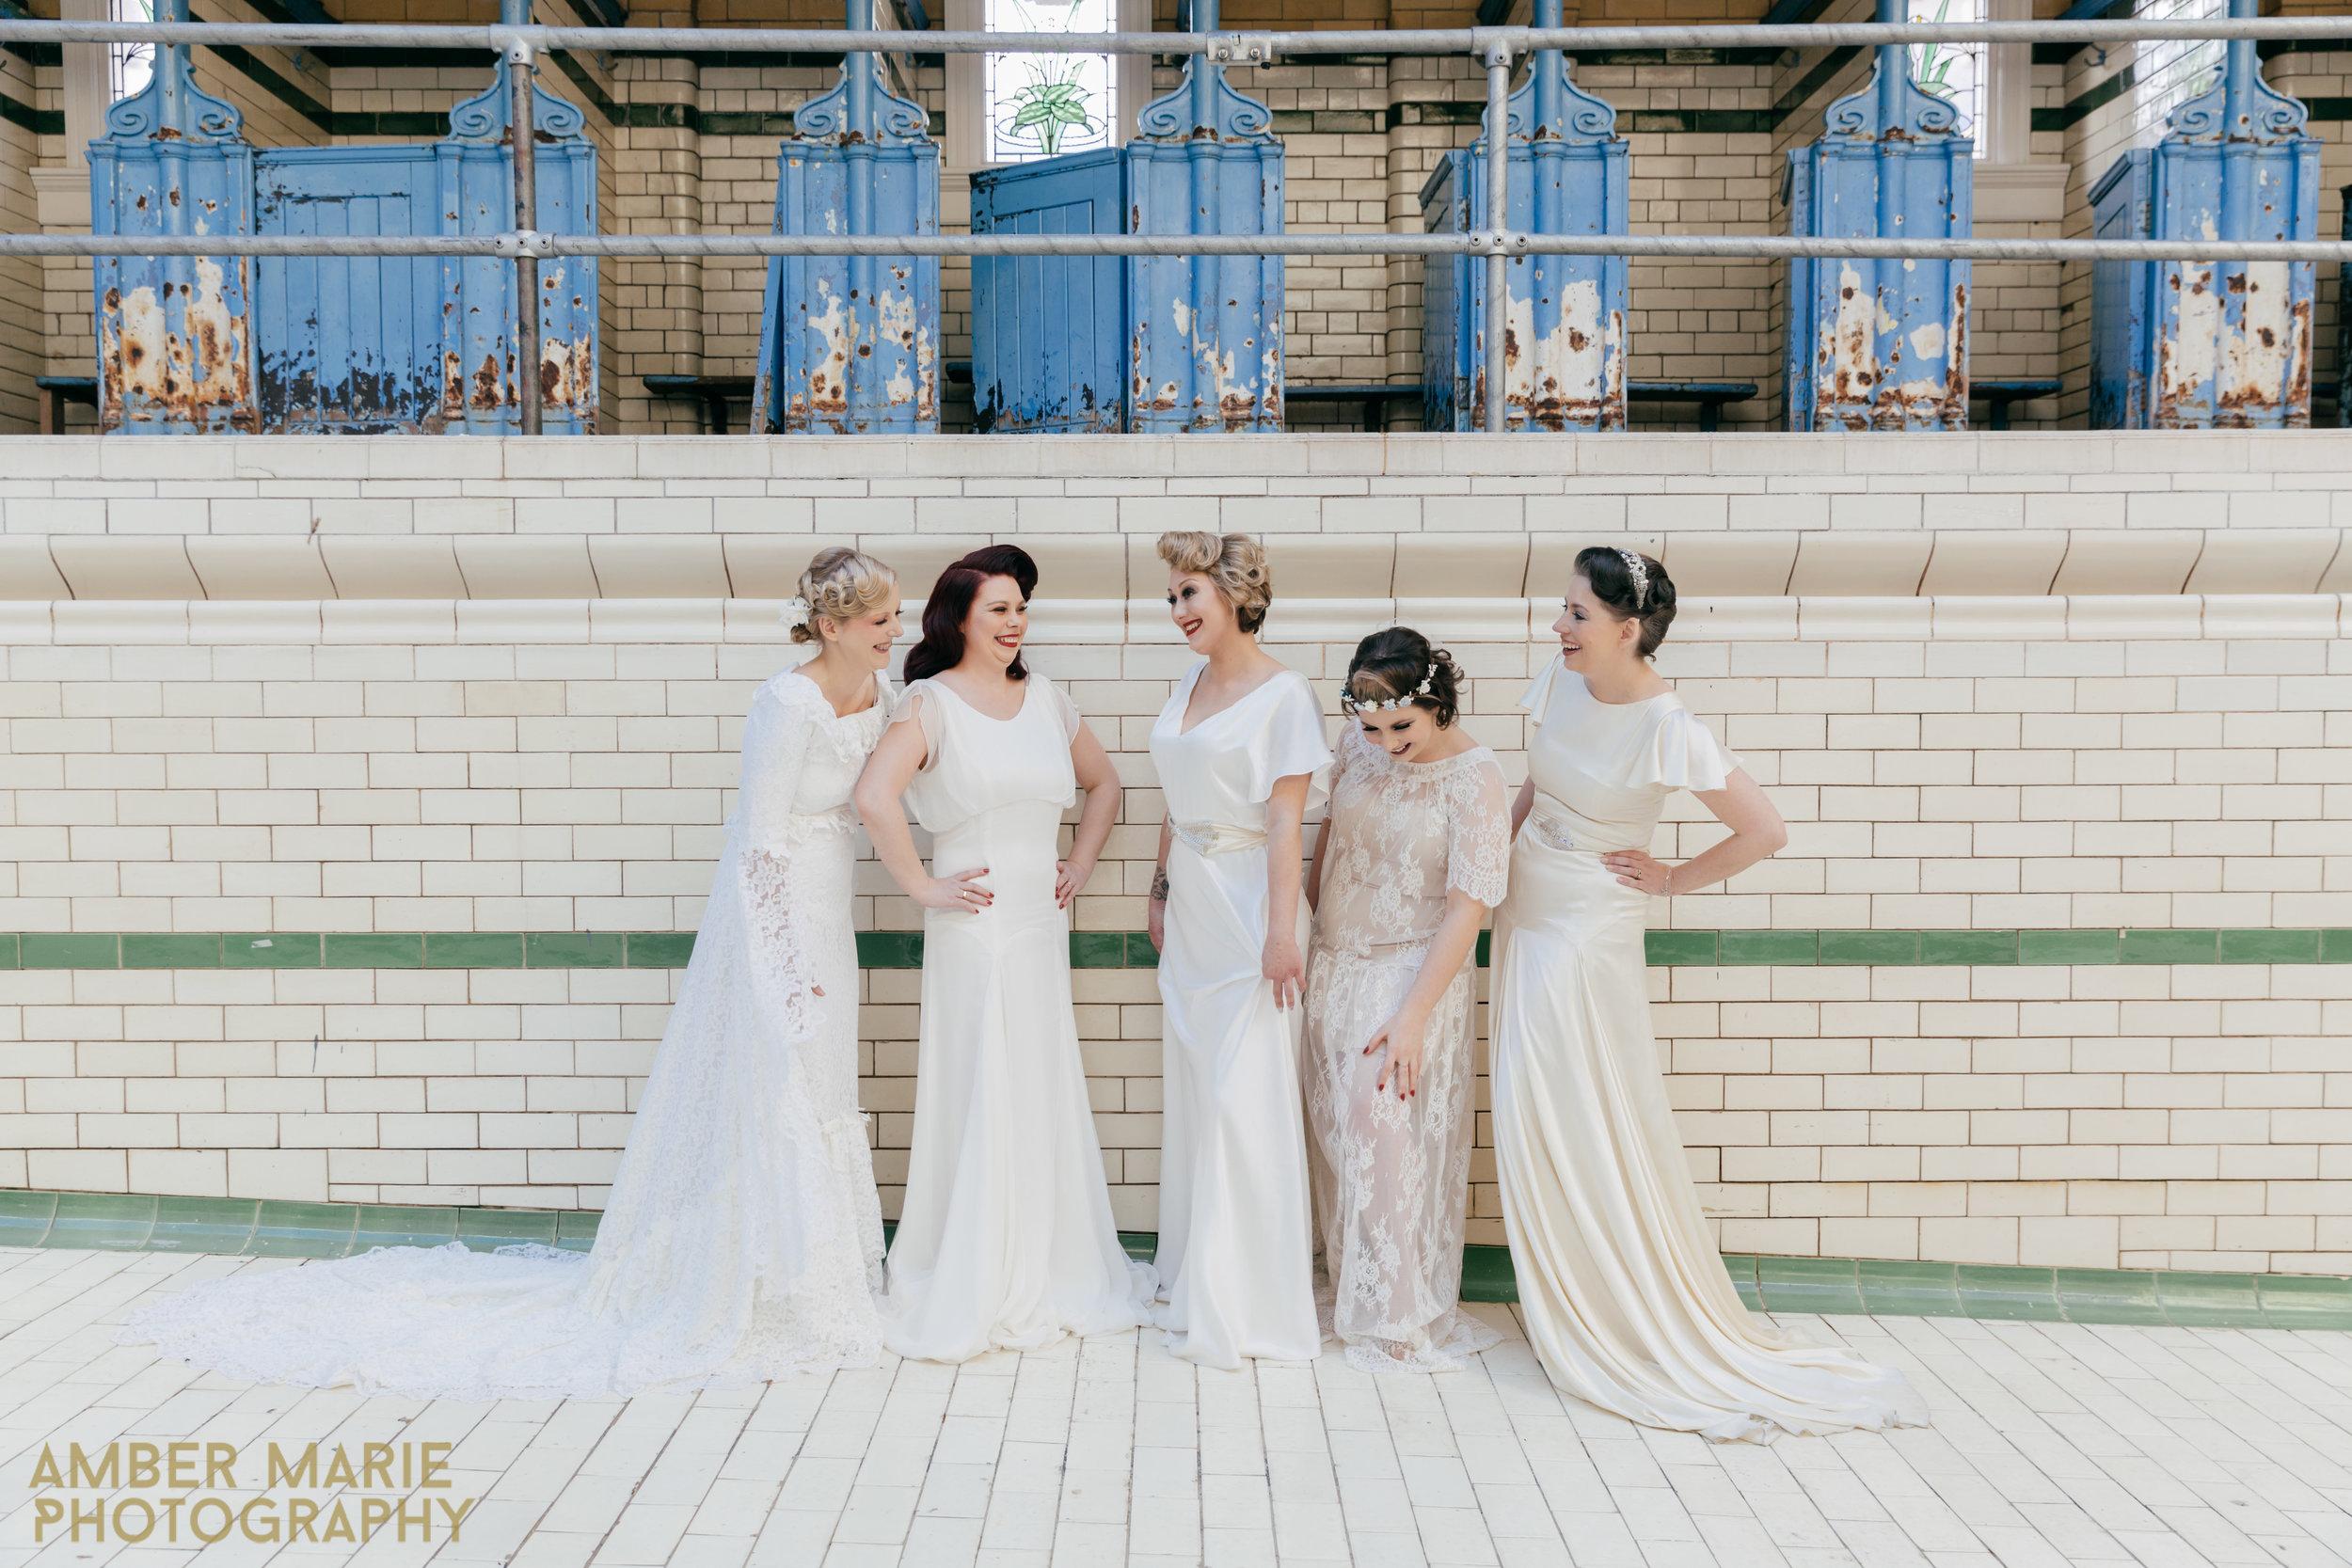 Manchester-Baths-Creative-Wedding-Photographers-Amber-Marie-Photography00120.jpg